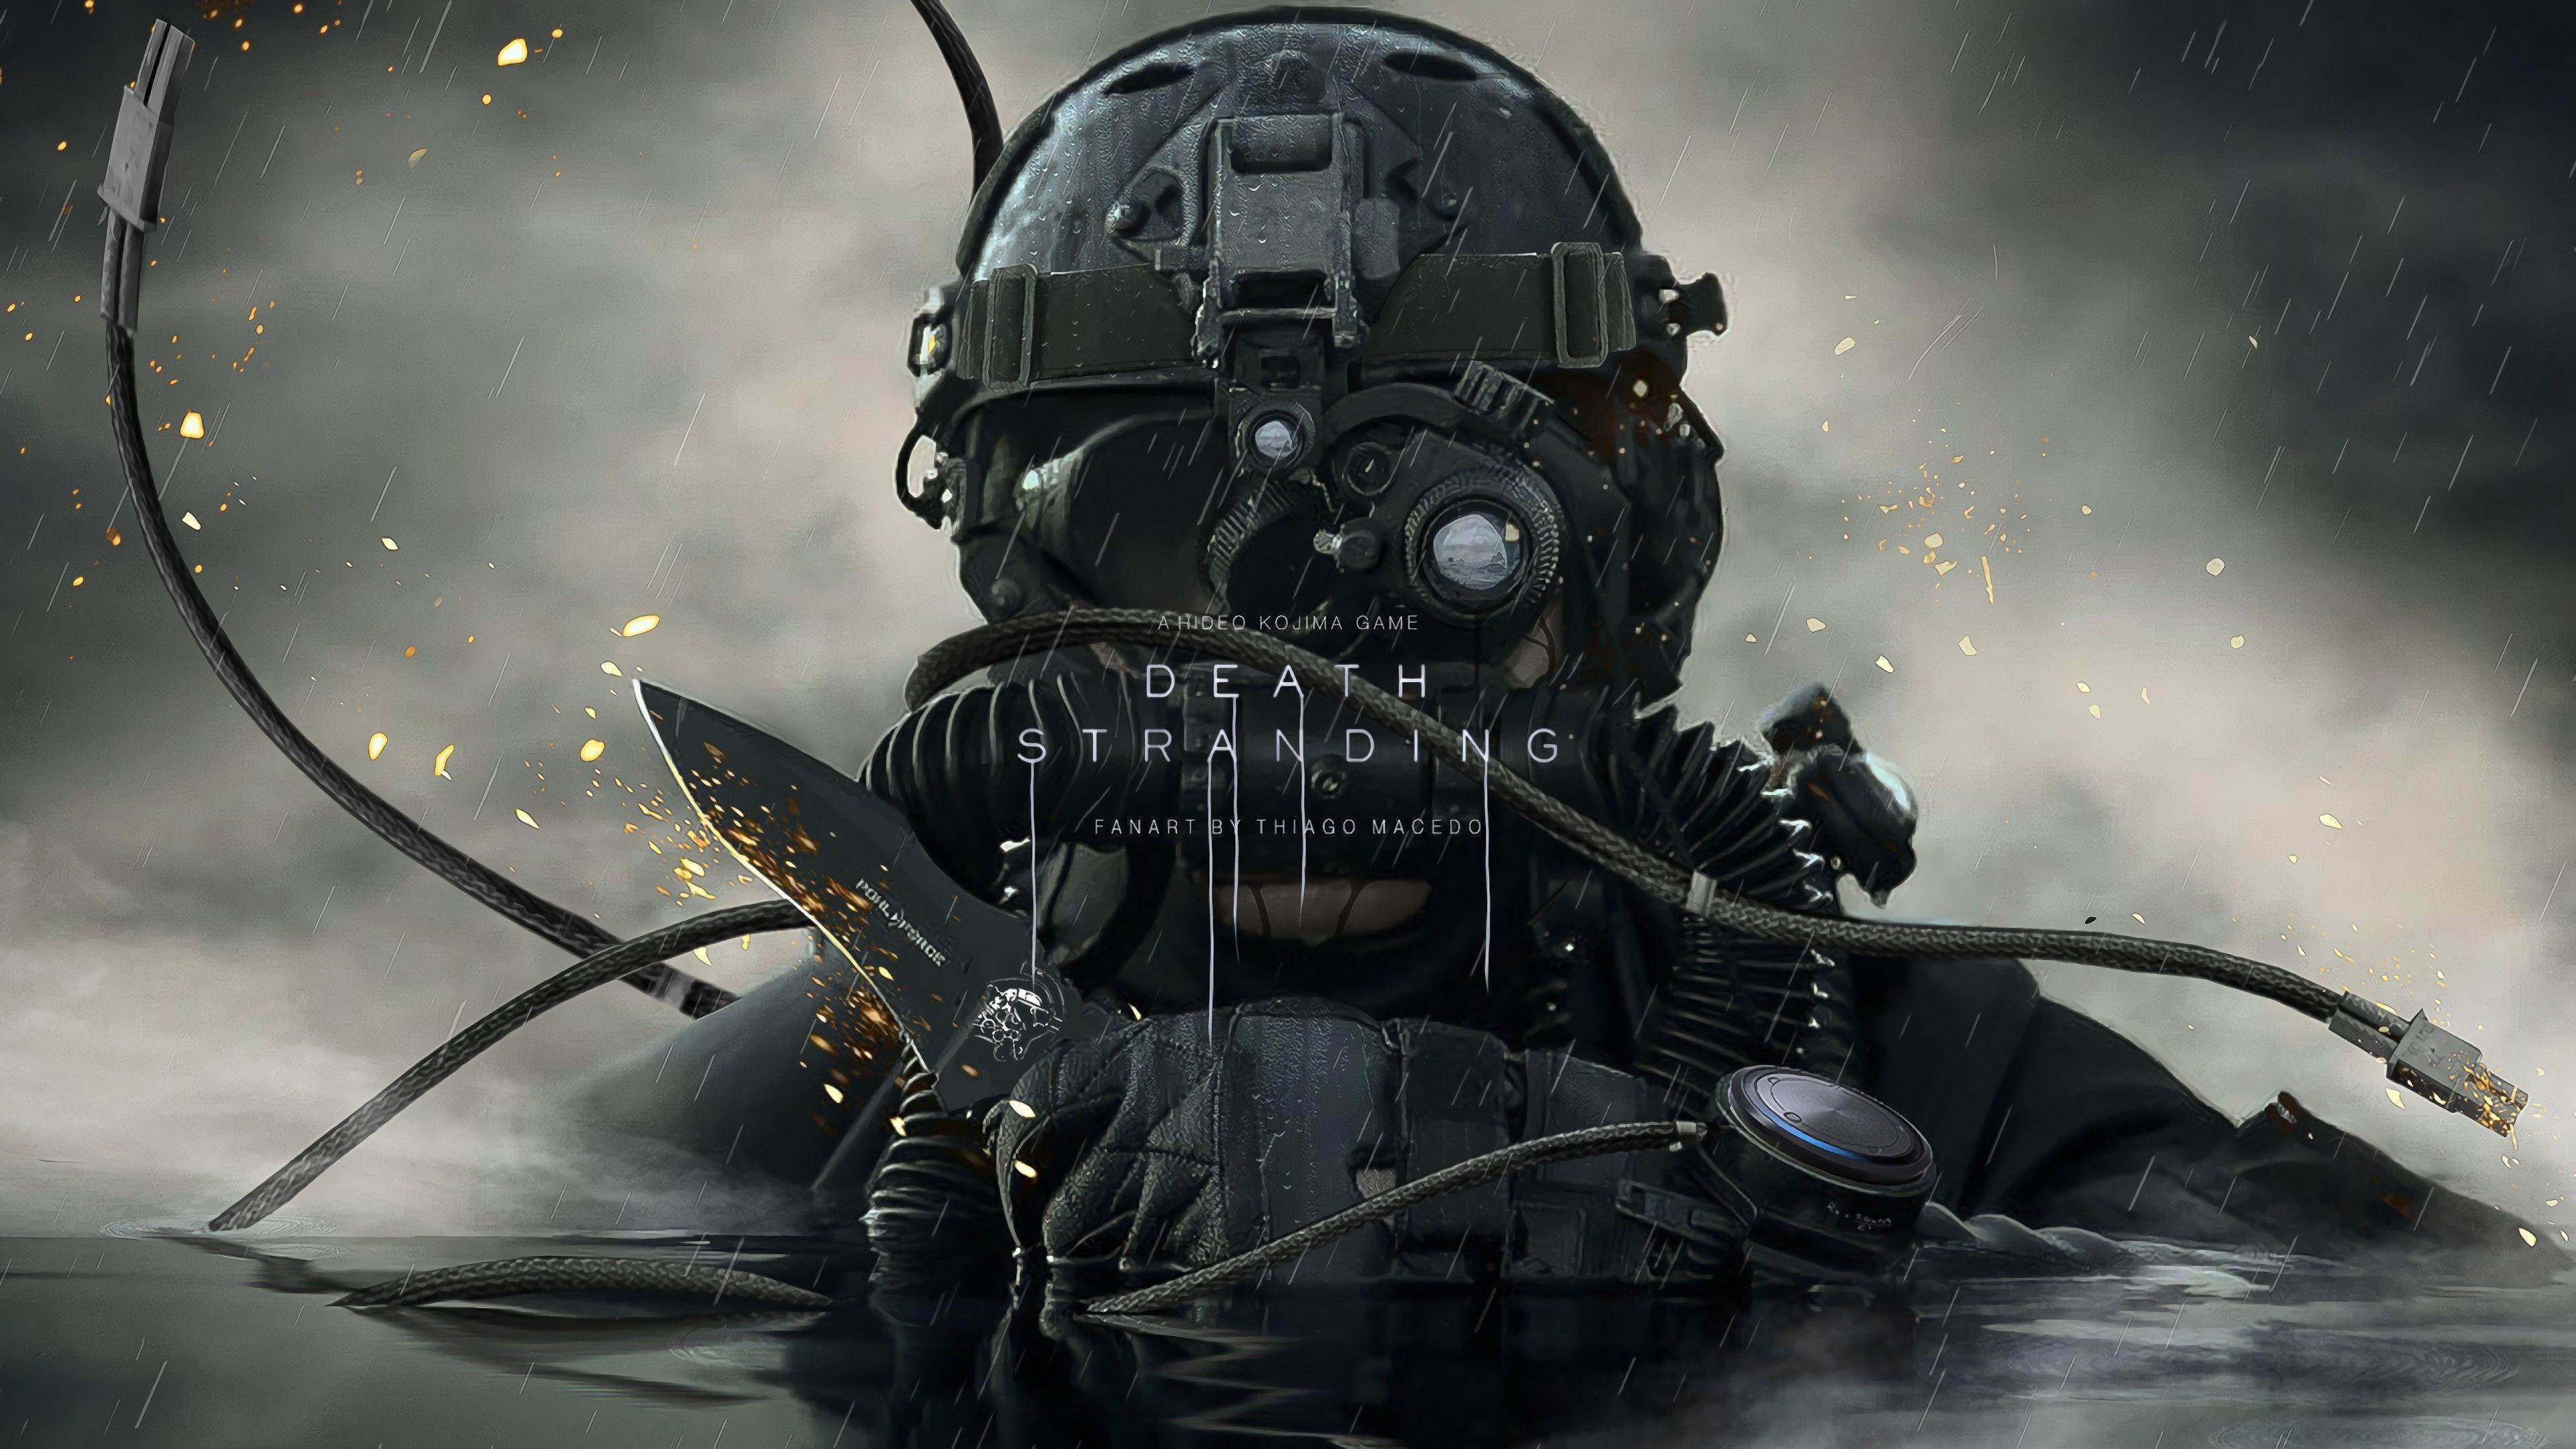 Death Stranding 4K Wallpapers - Top Free Death Stranding ...